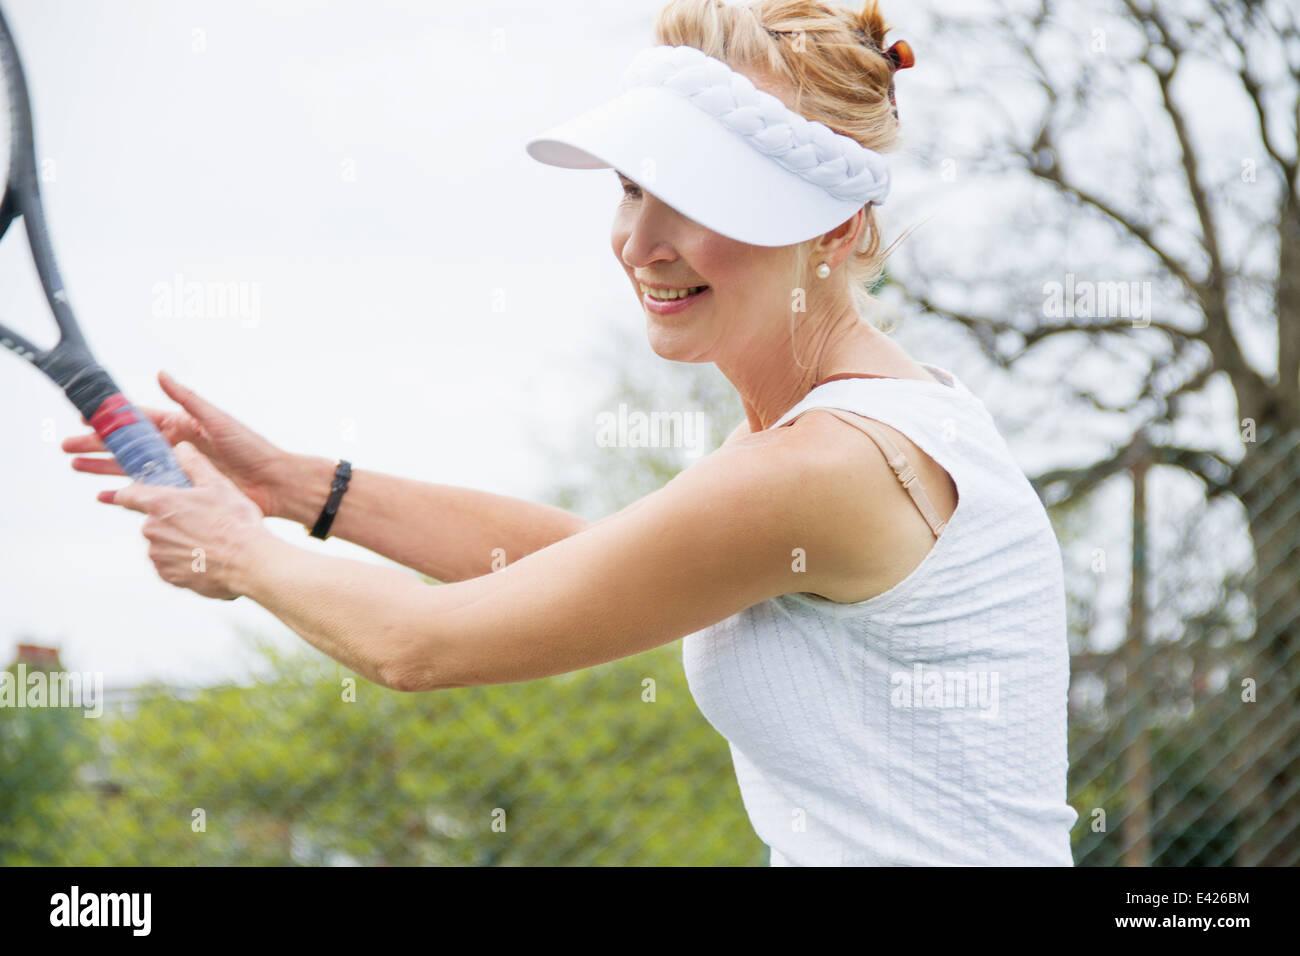 Mature female tennis player playing tennis - Stock Image